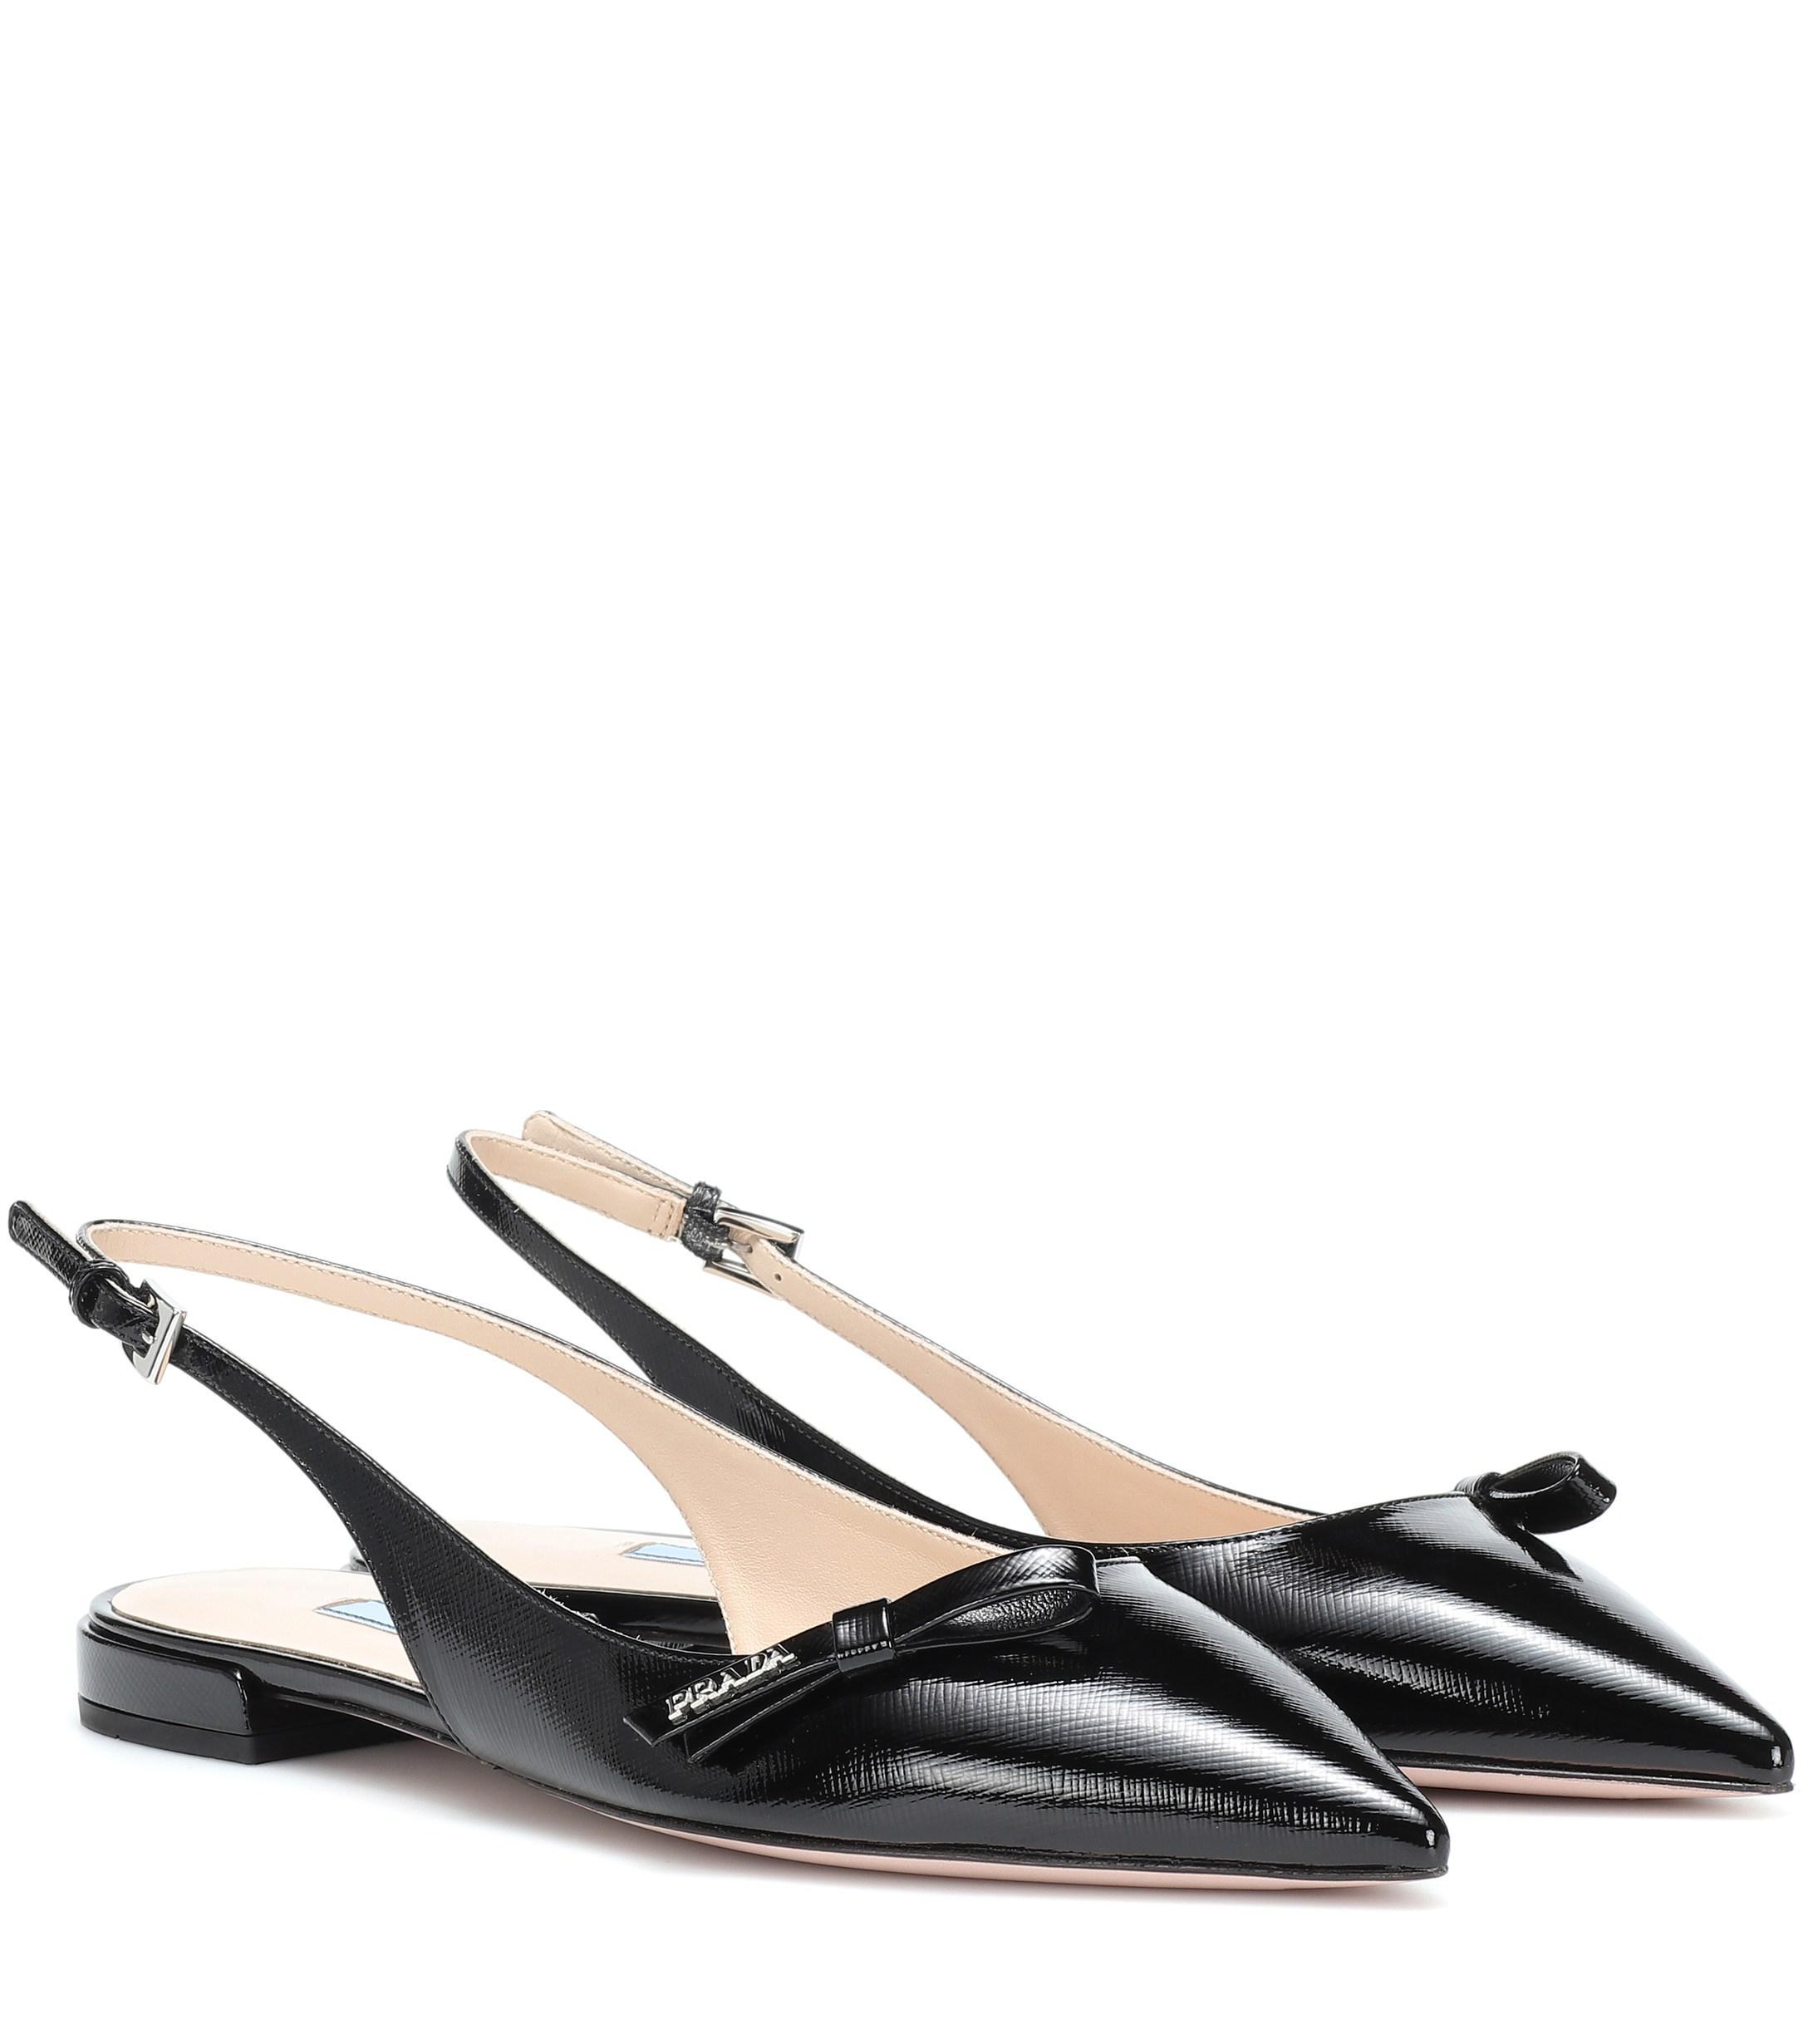 0dc7cc938a4 Prada - Black Leather Slingback Ballet Flats - Lyst. View fullscreen